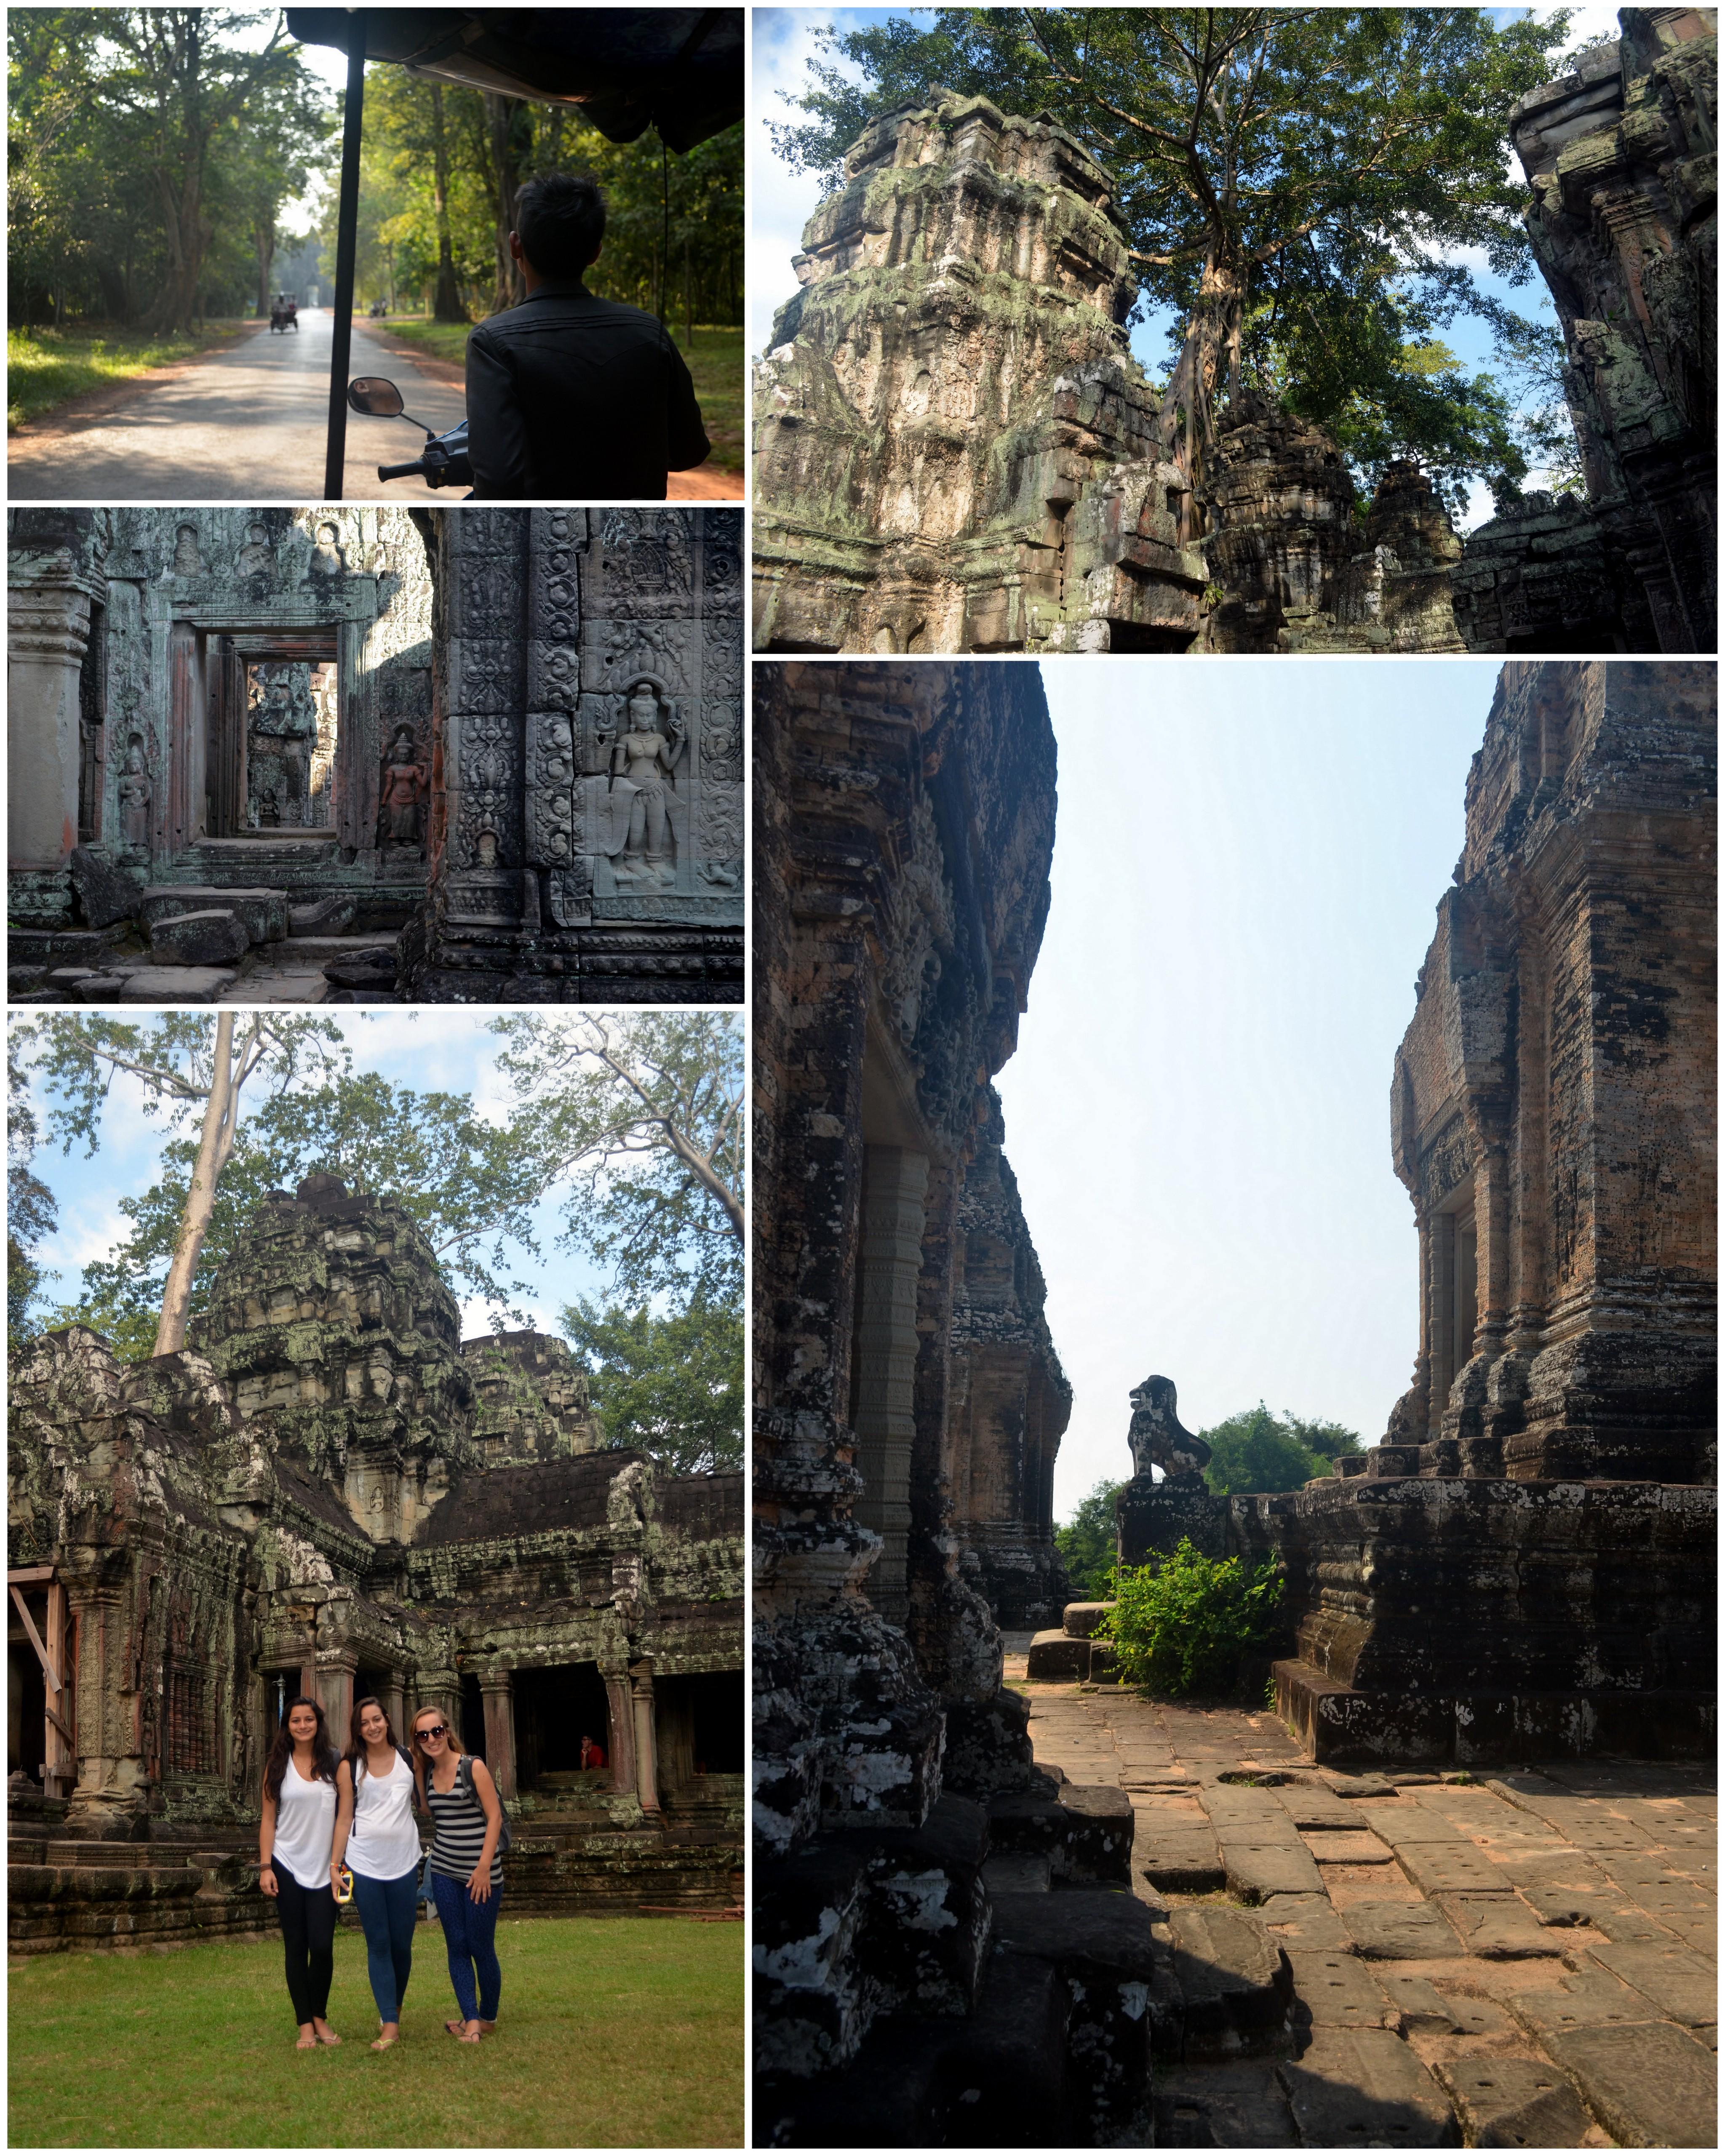 Cambodja edited